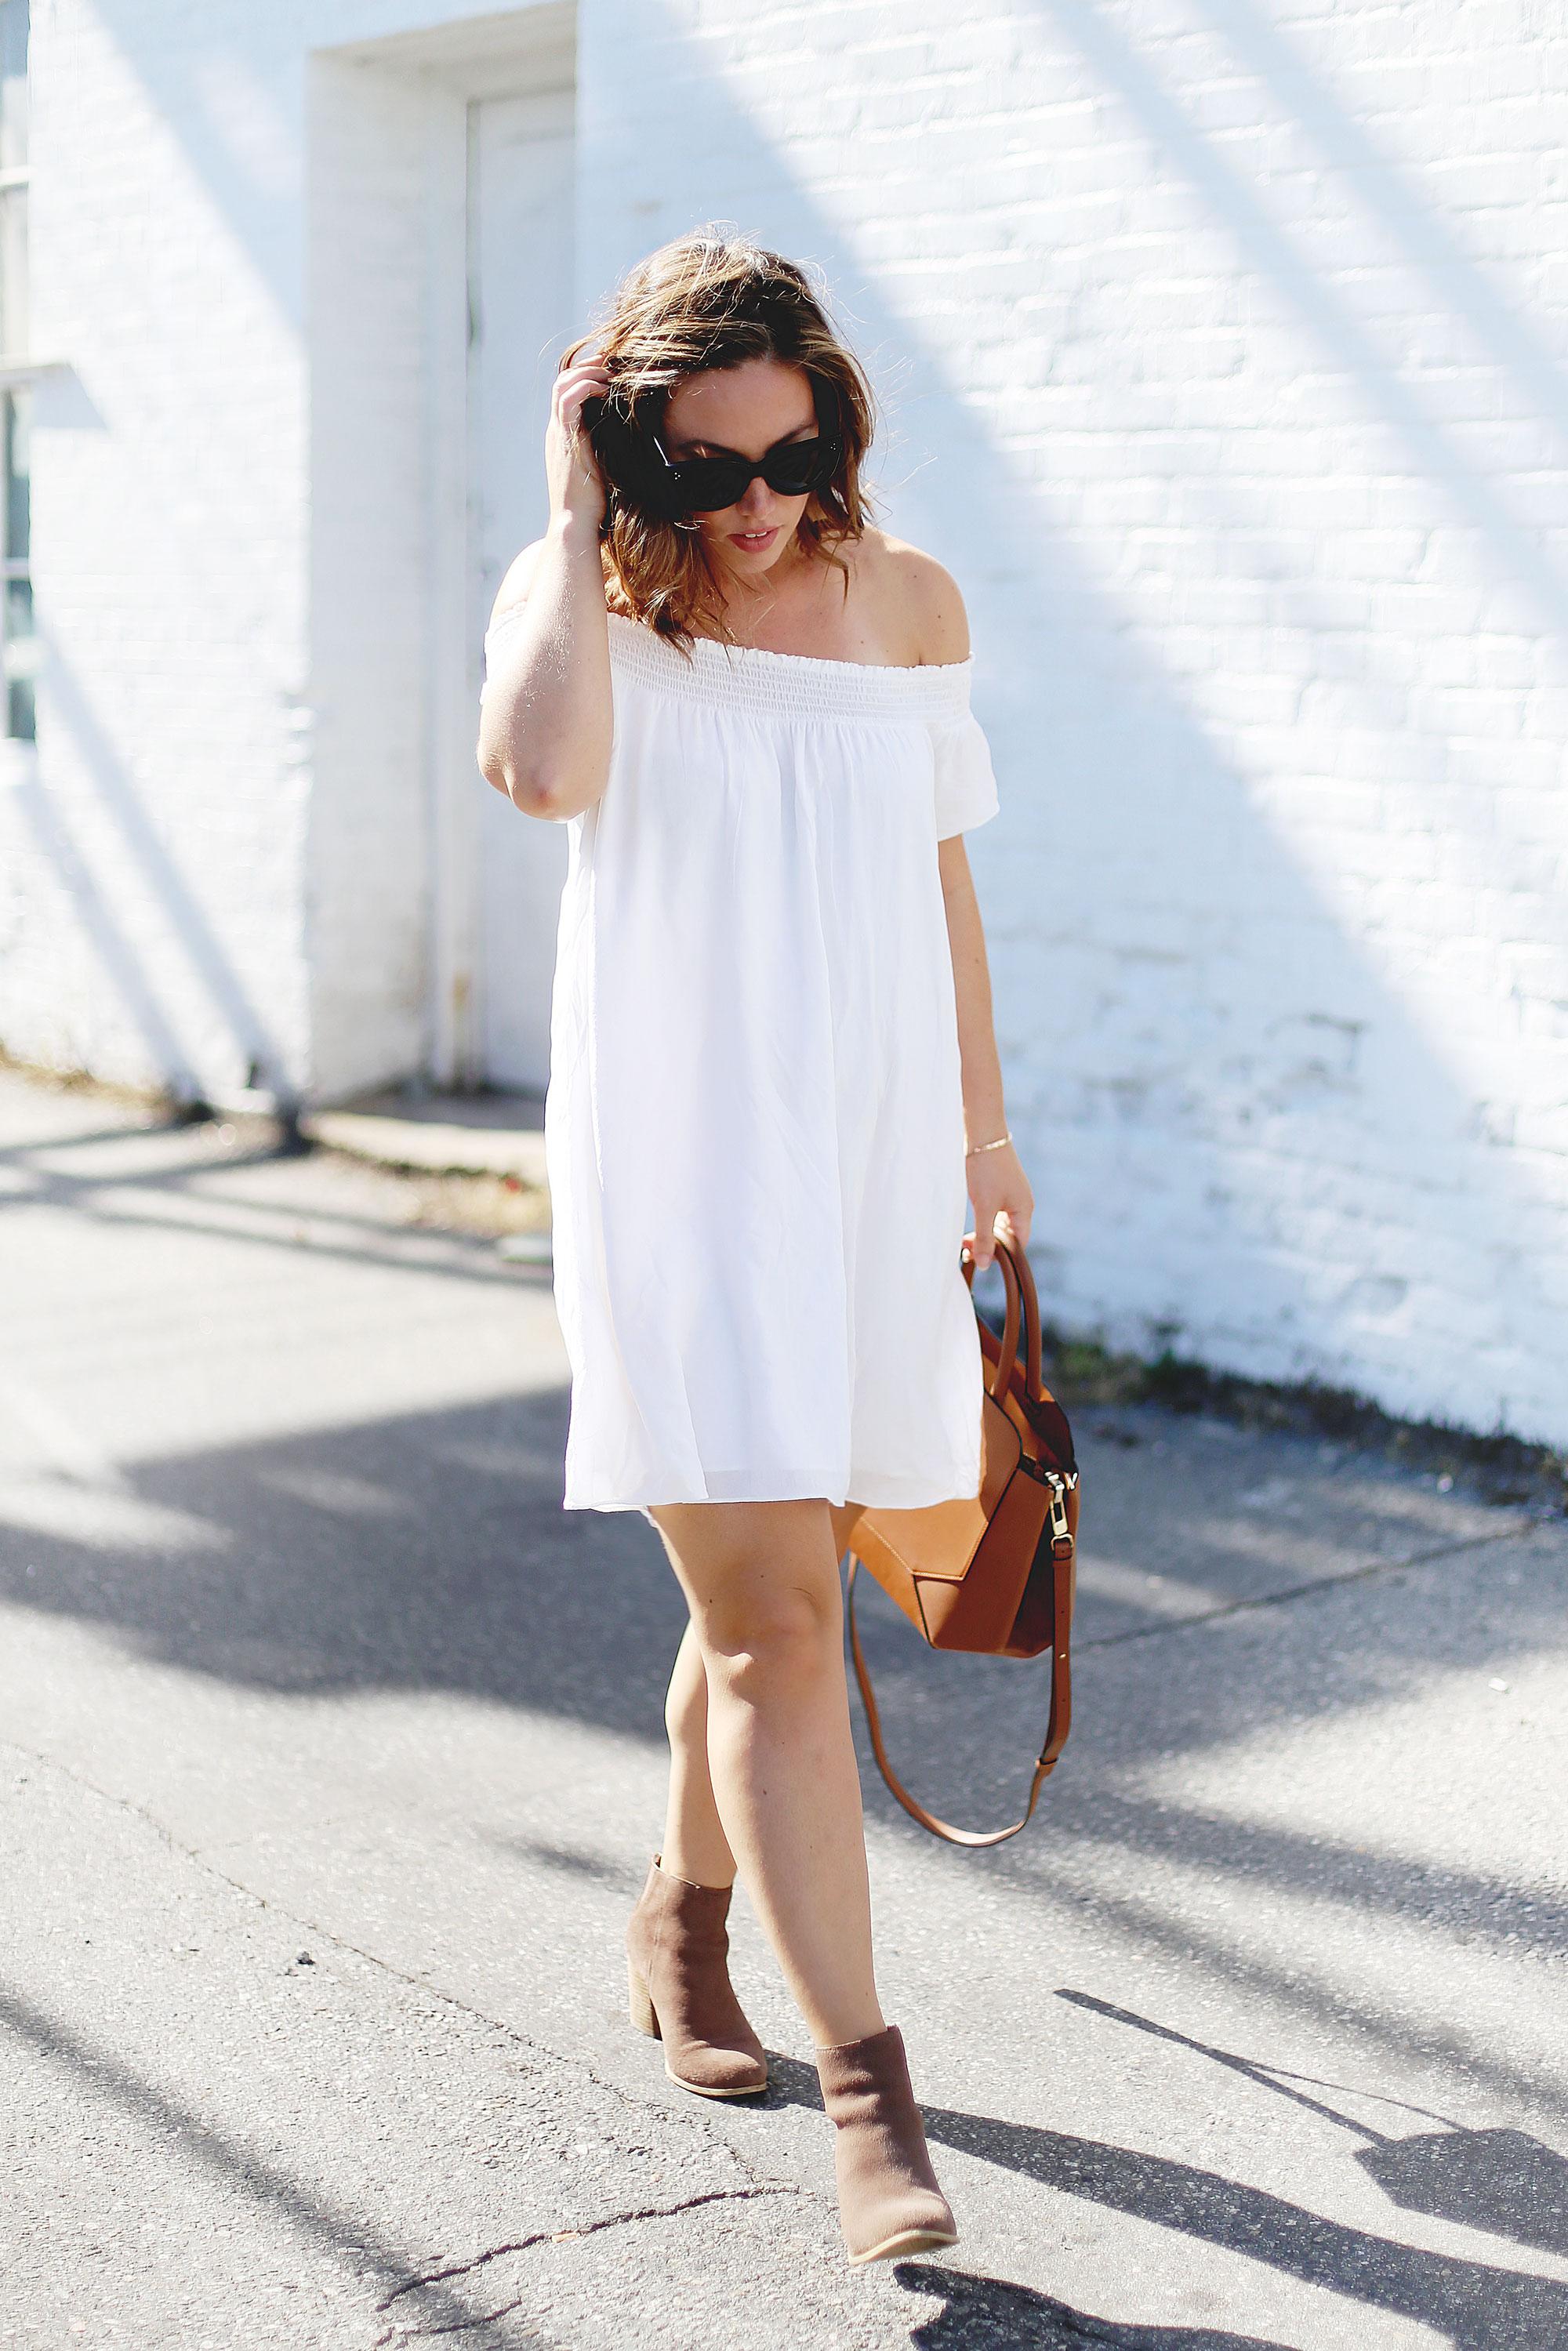 Off the shoulder dress styling